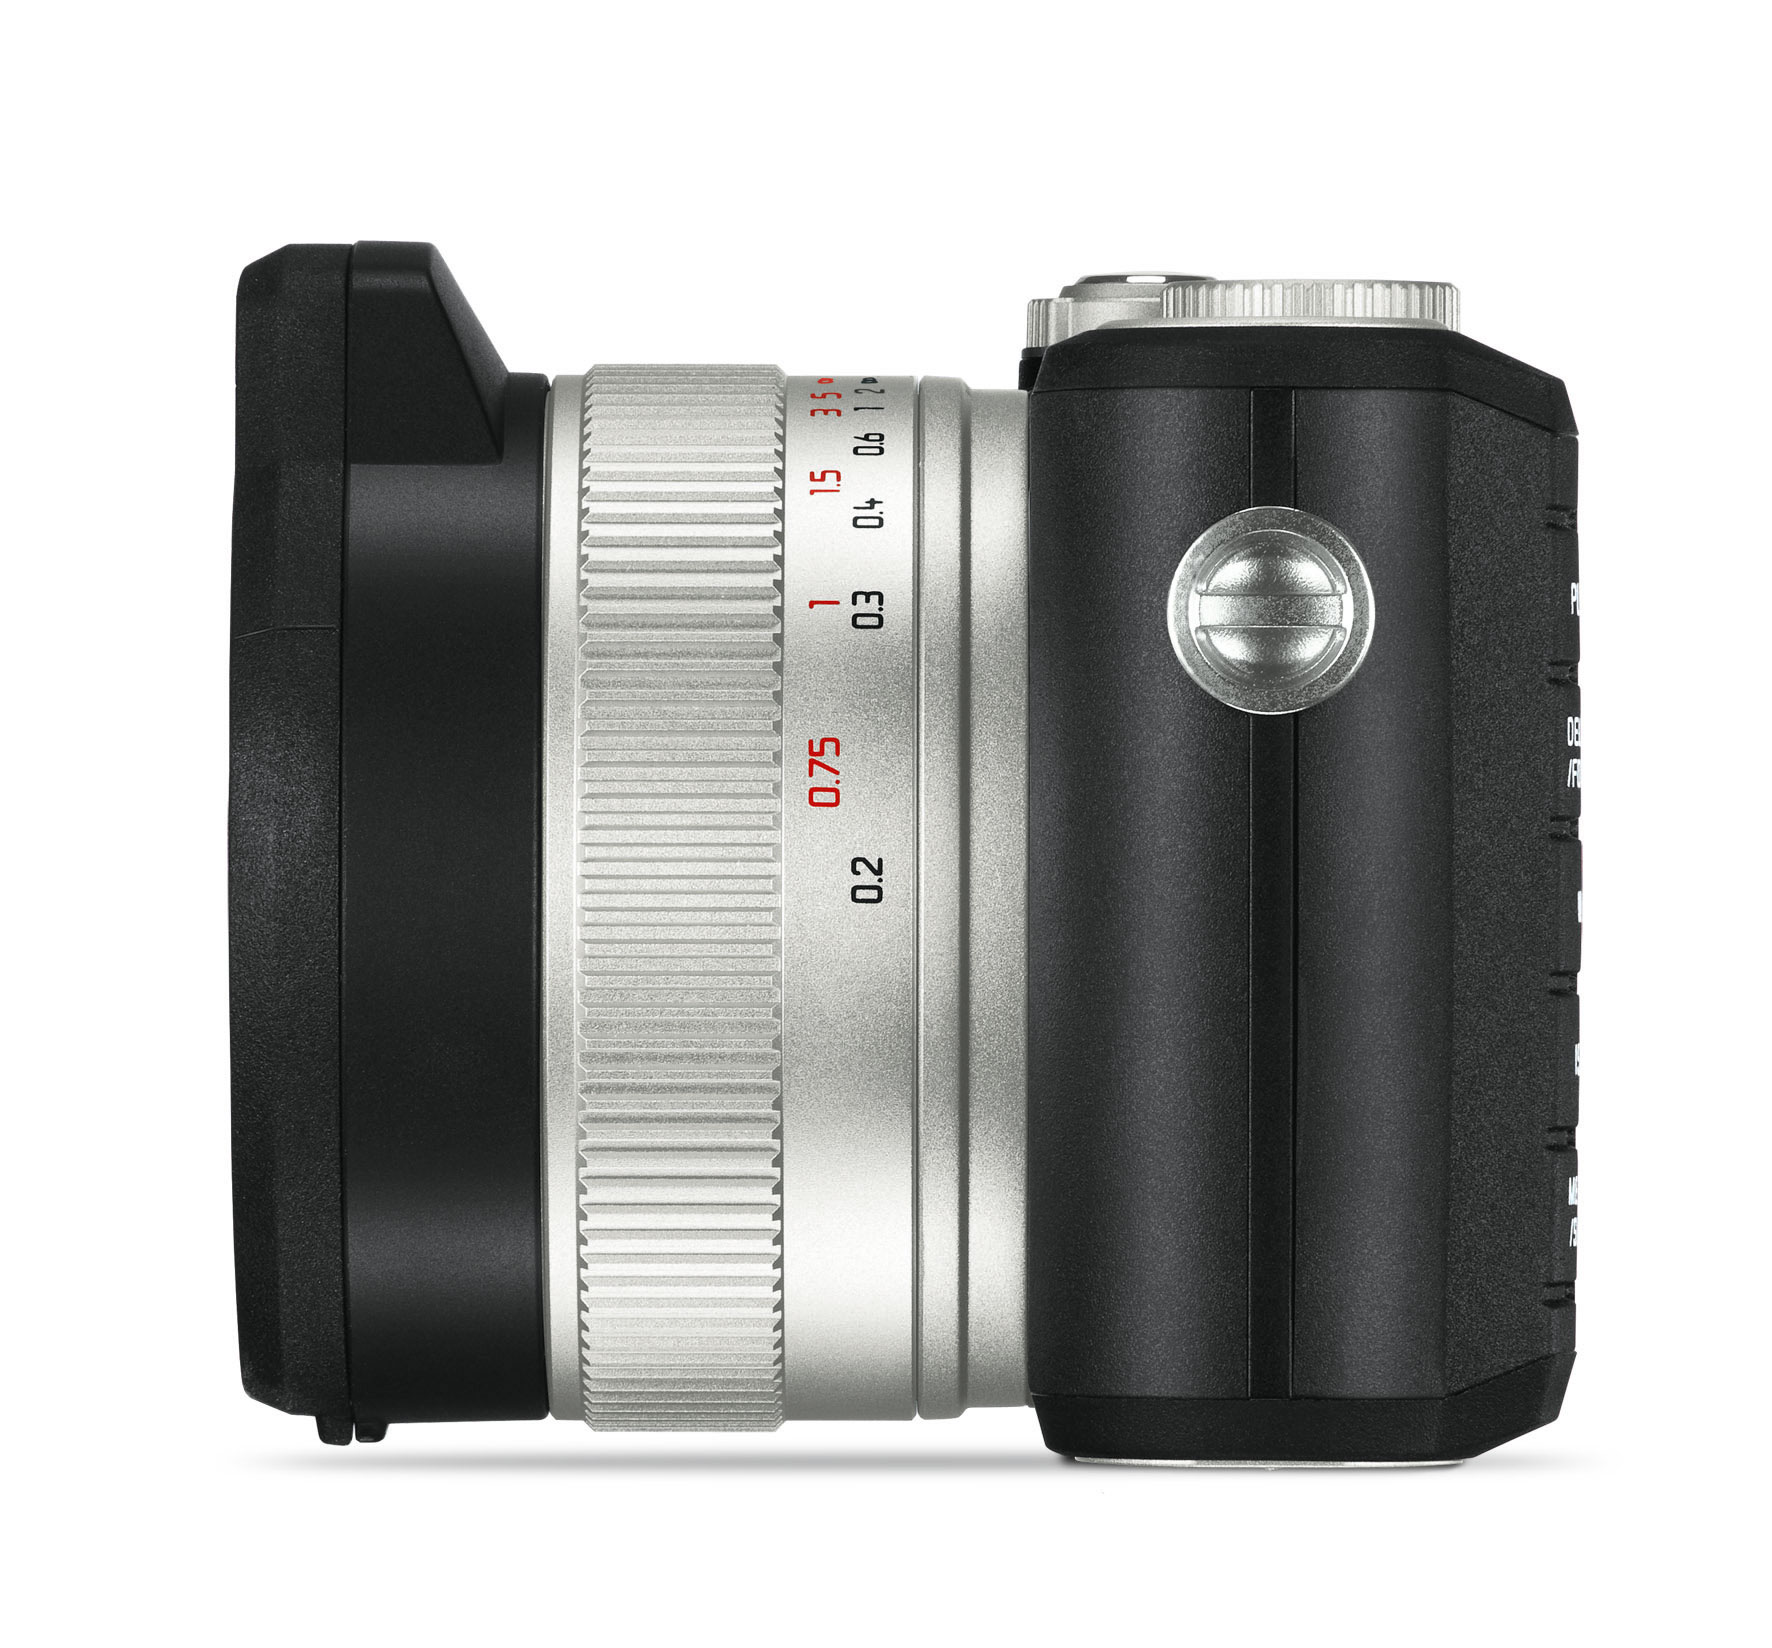 The Leica X-U